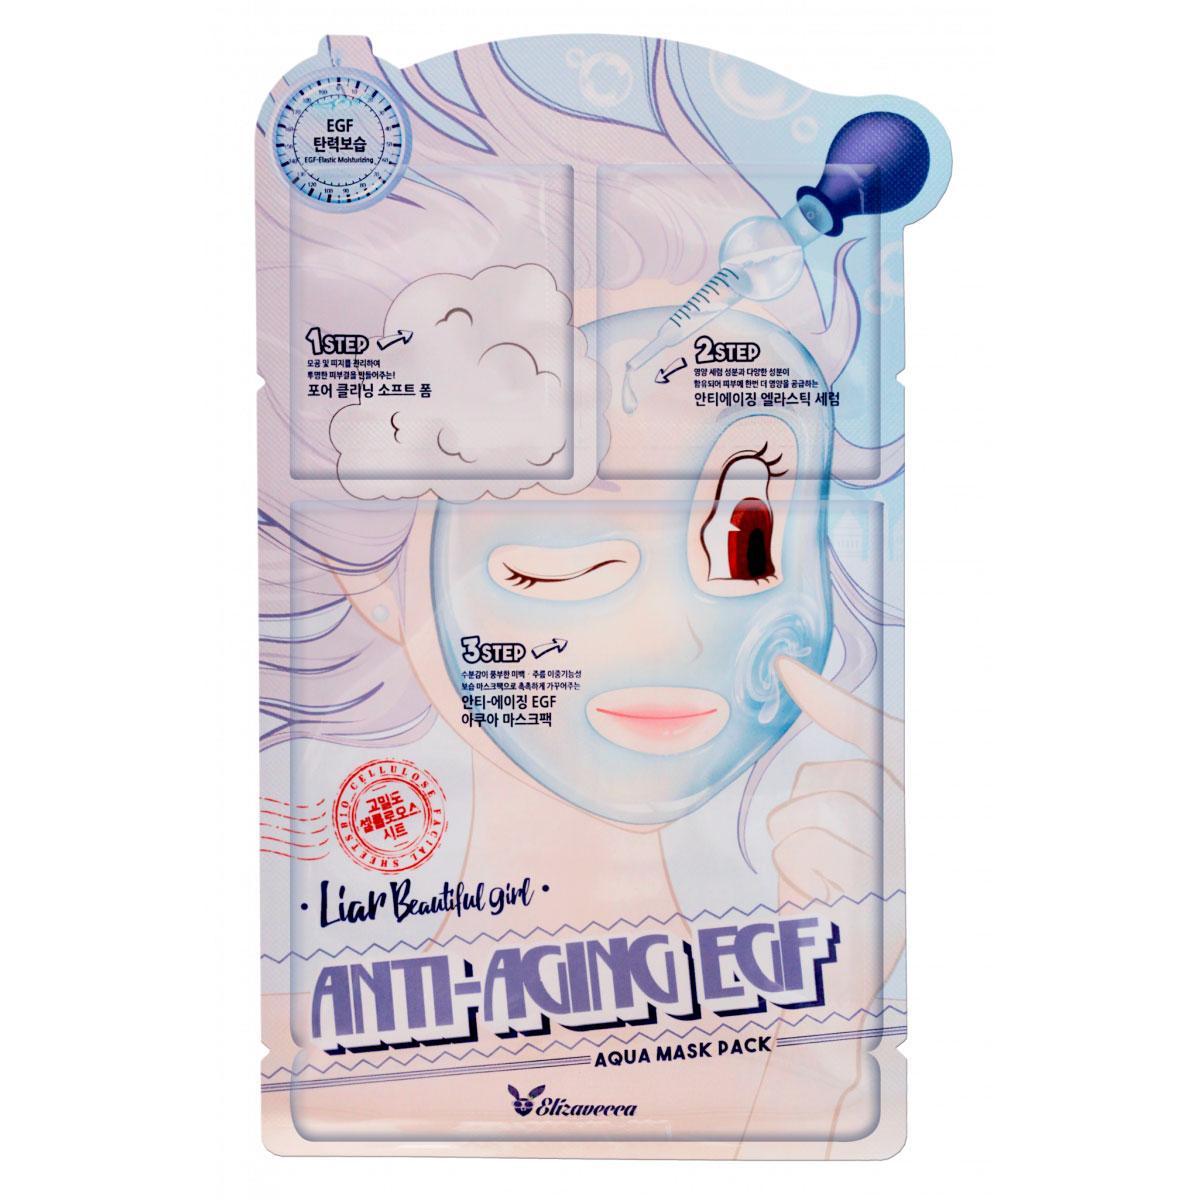 Трехступенчатая антивозрастная маска Elizavecca Anti Aging EGF Aqua Mask Pack